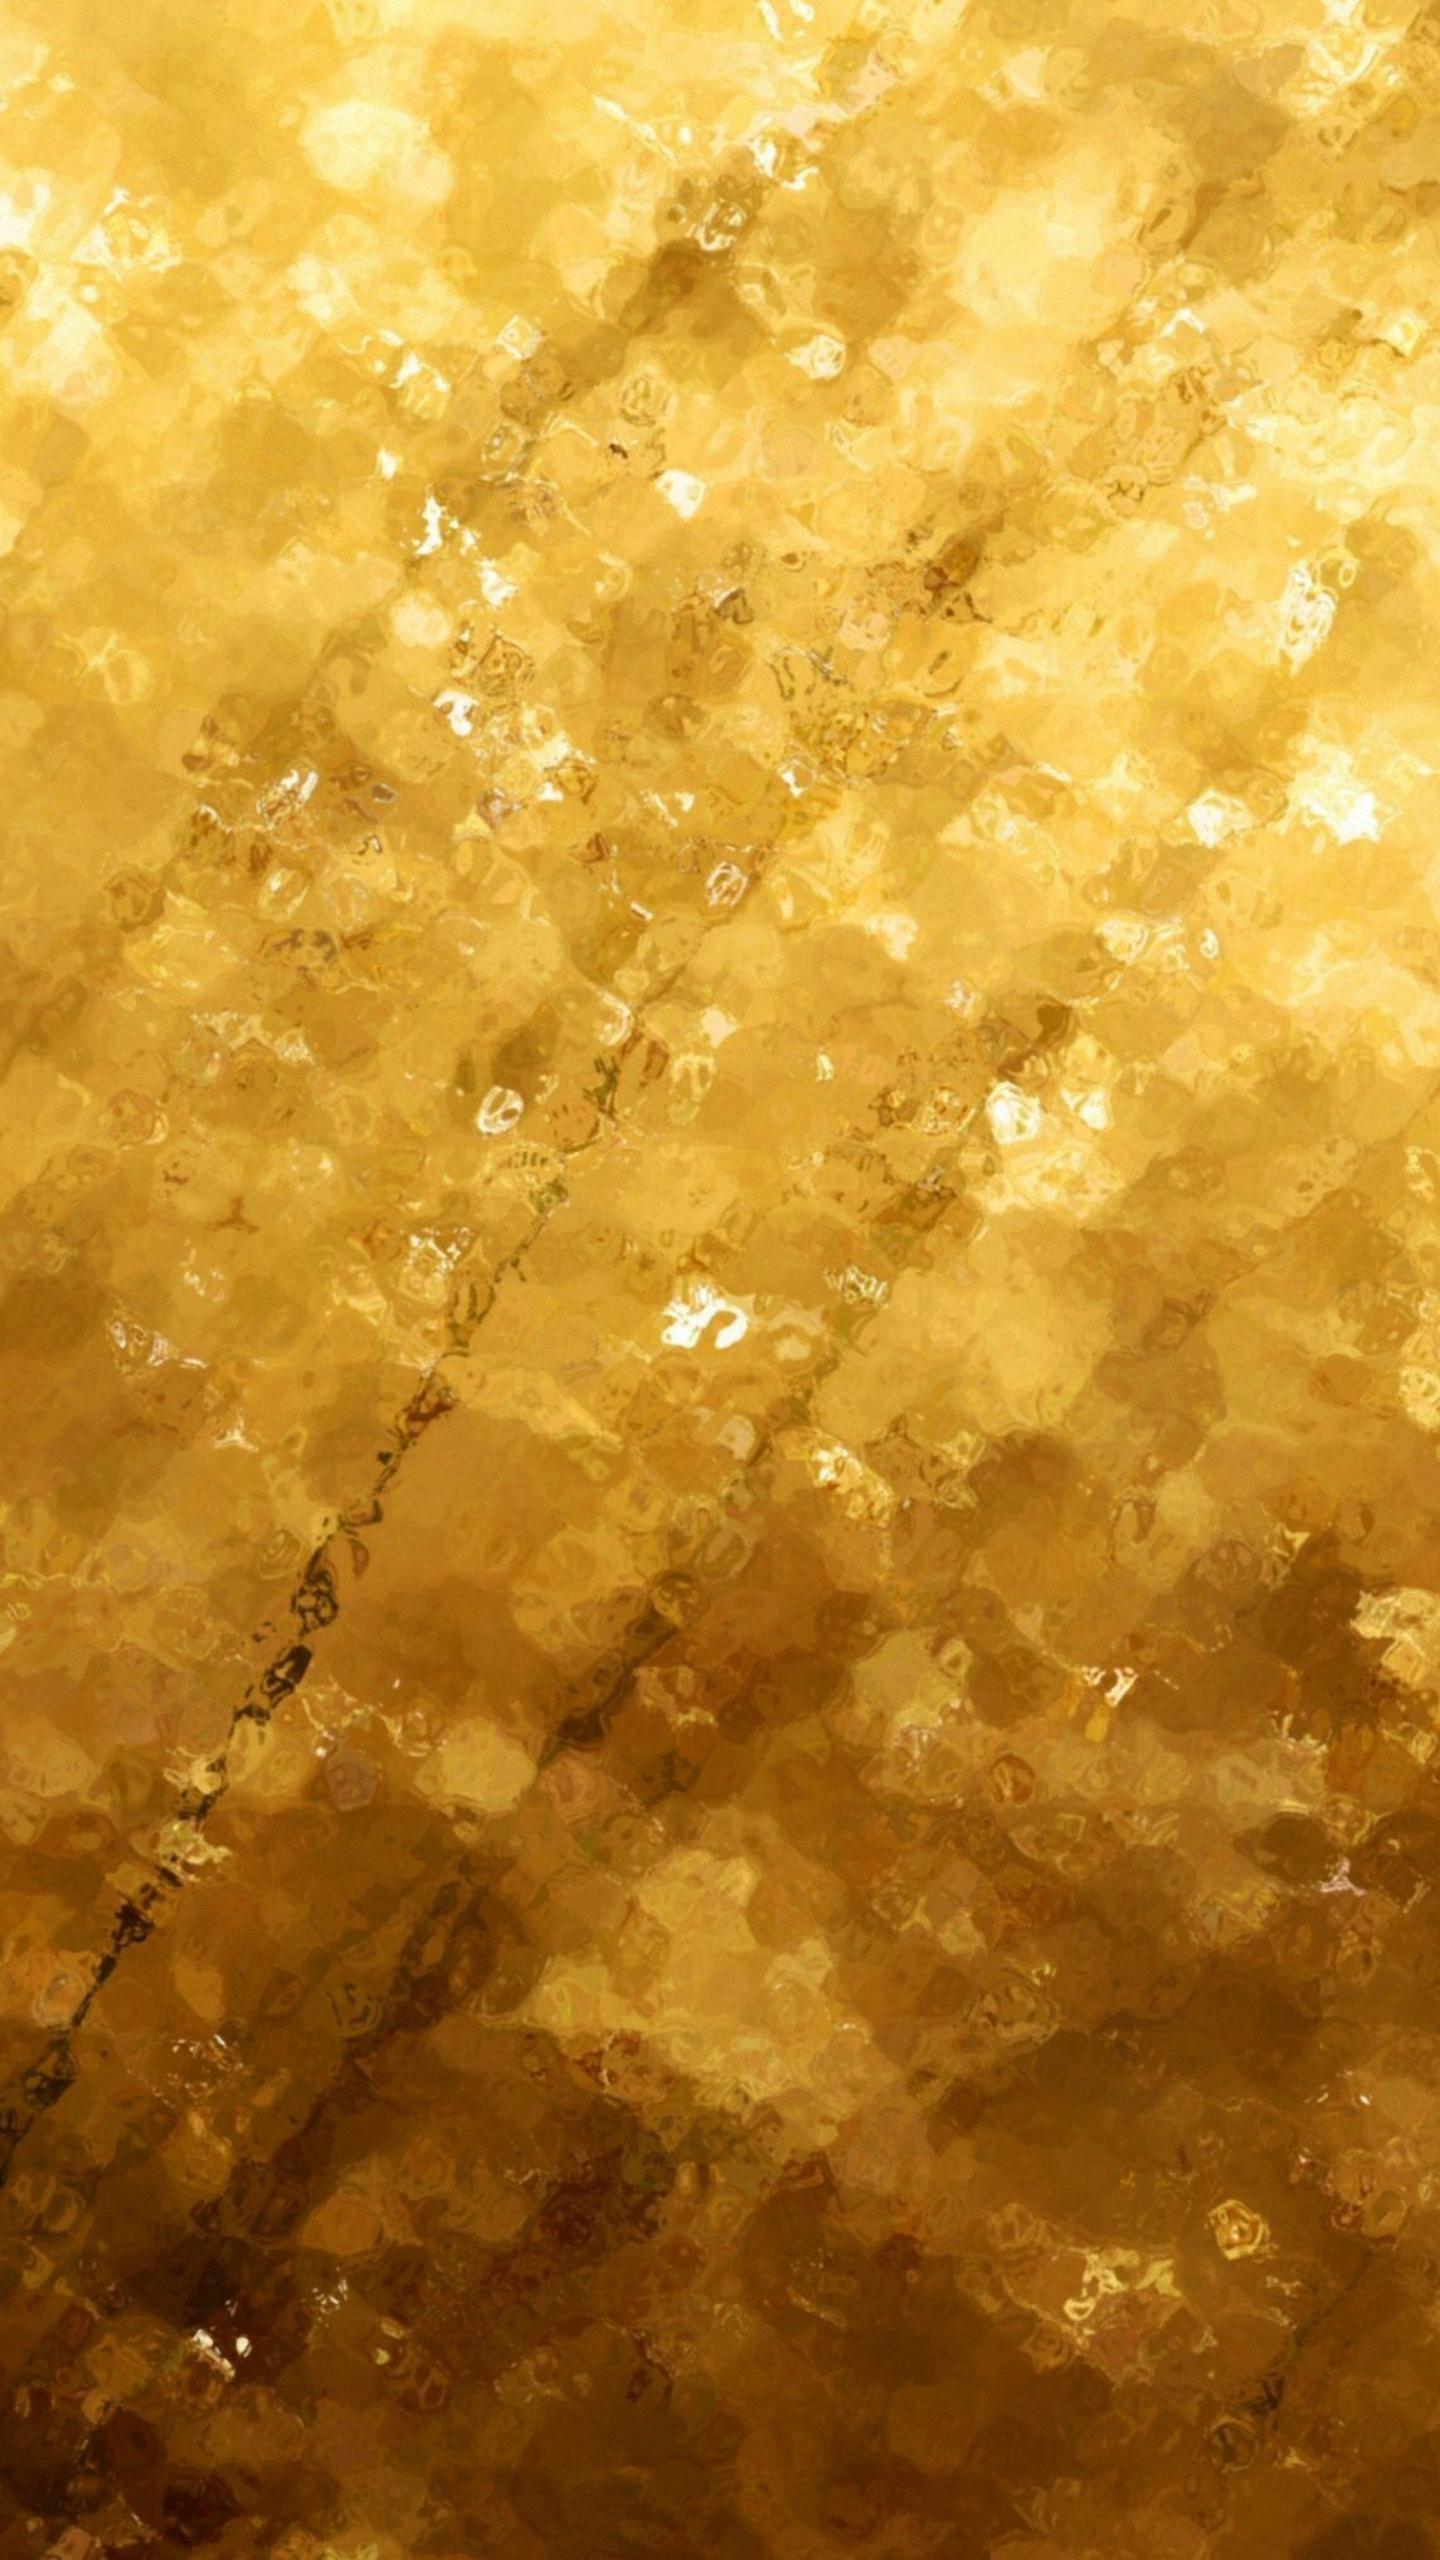 Golden Samsung Mobile Wallpapers Wallpaper Cave